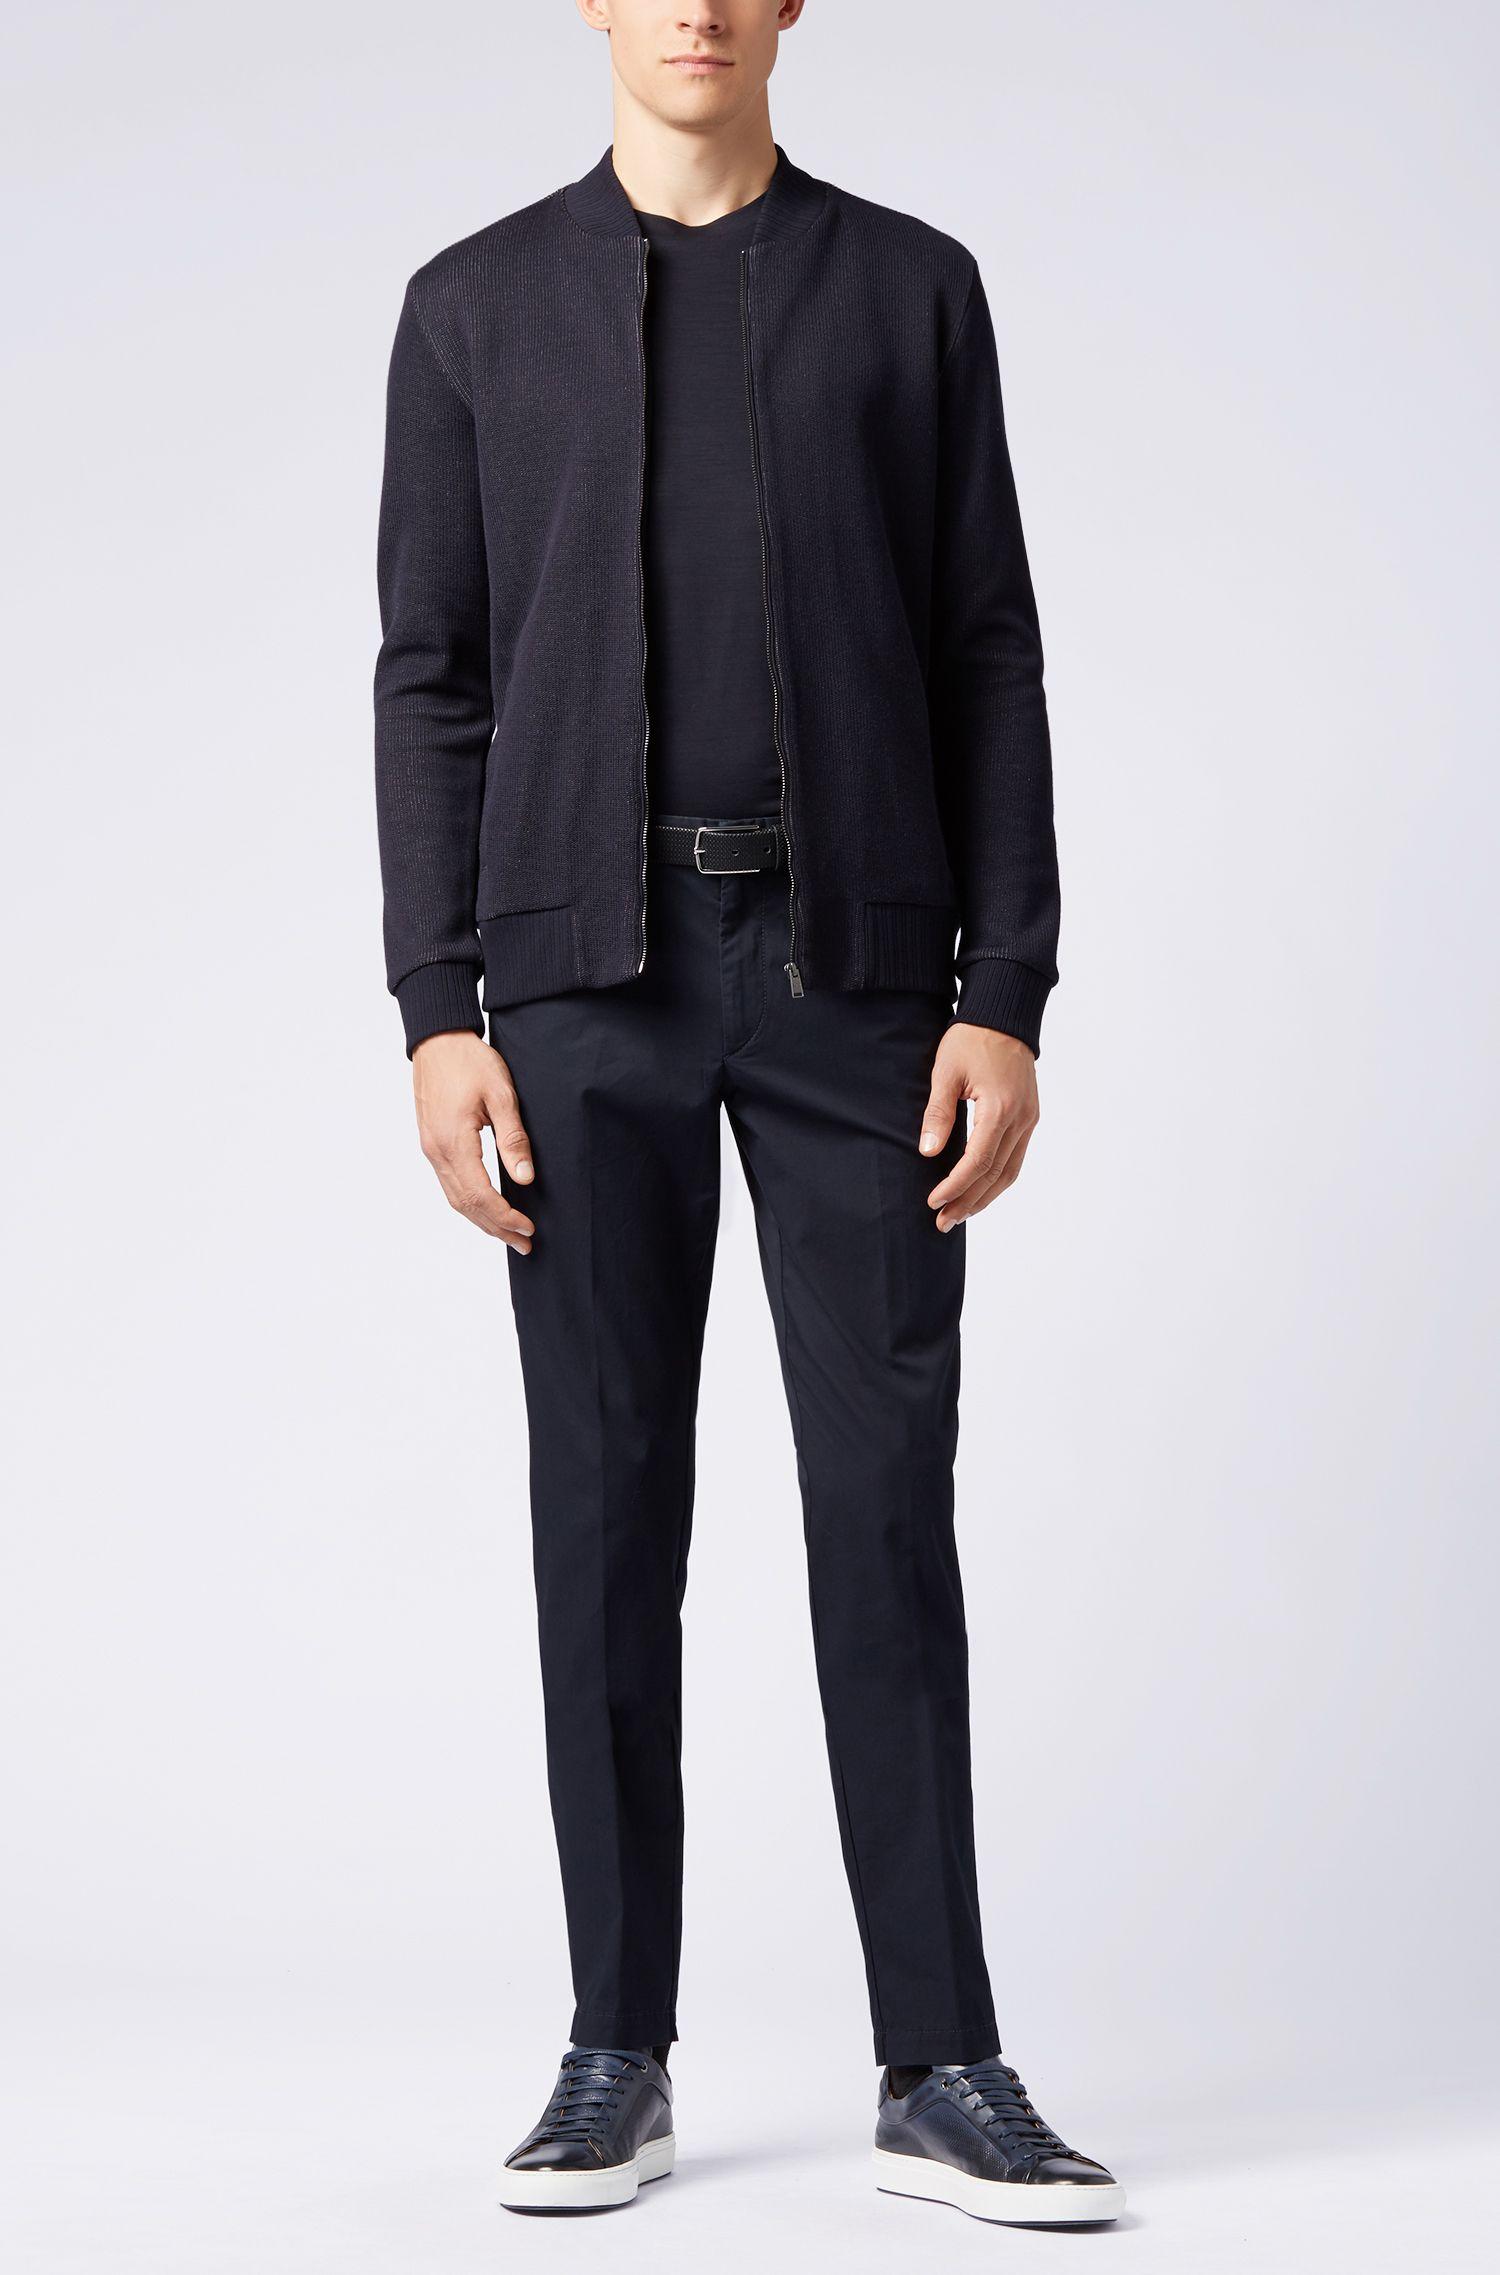 Blouson-style zipped sweatshirt in double-faced cotton jersey